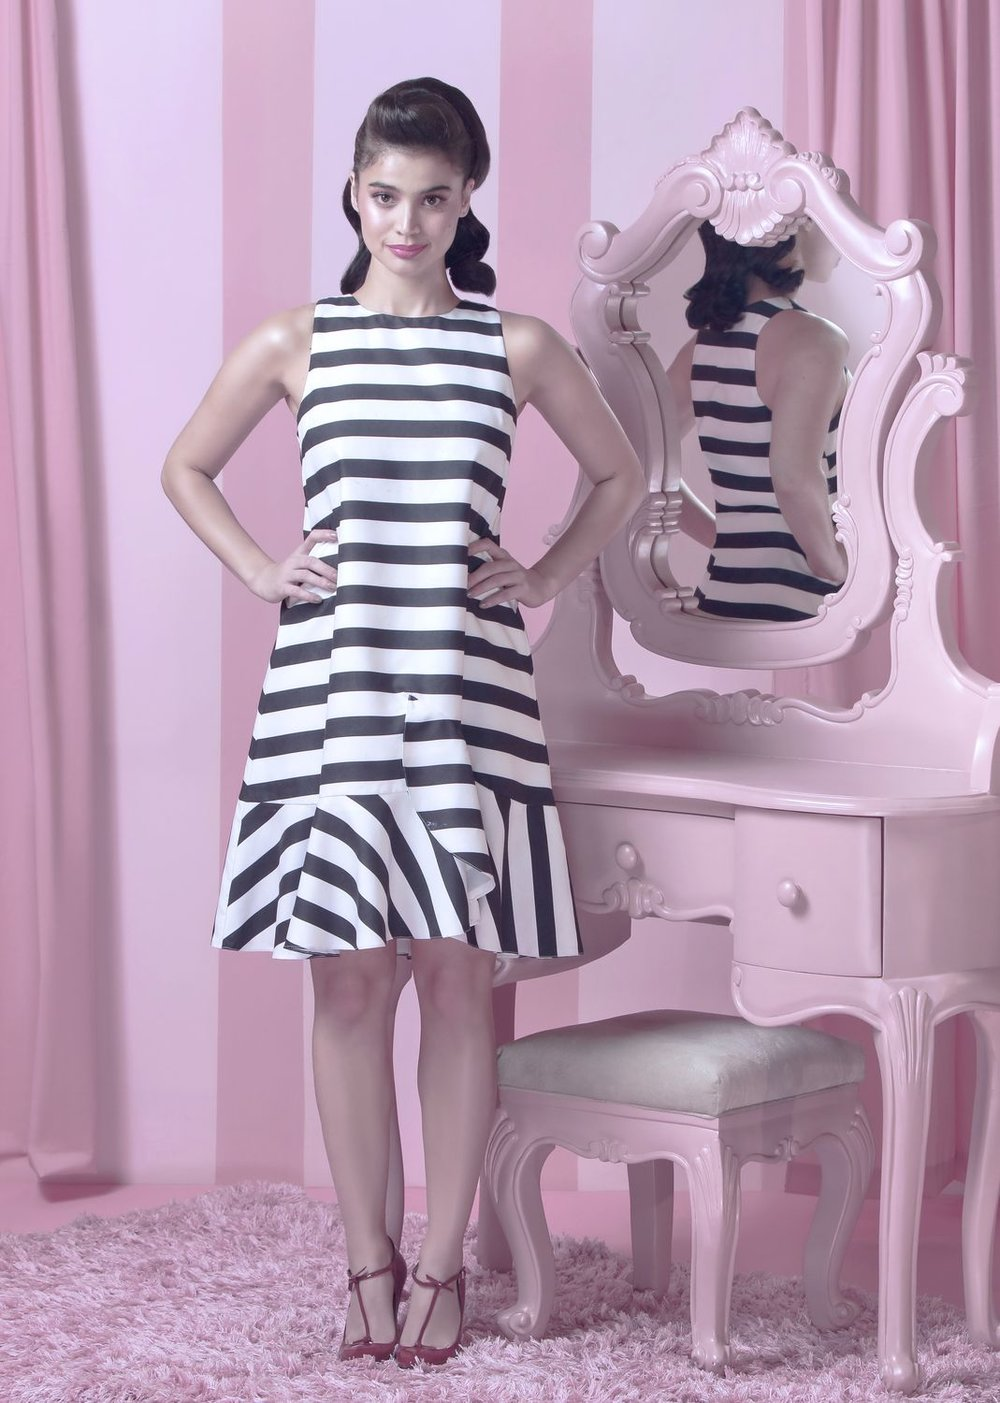 Teenage Fashion_Anne Curtis.jpg